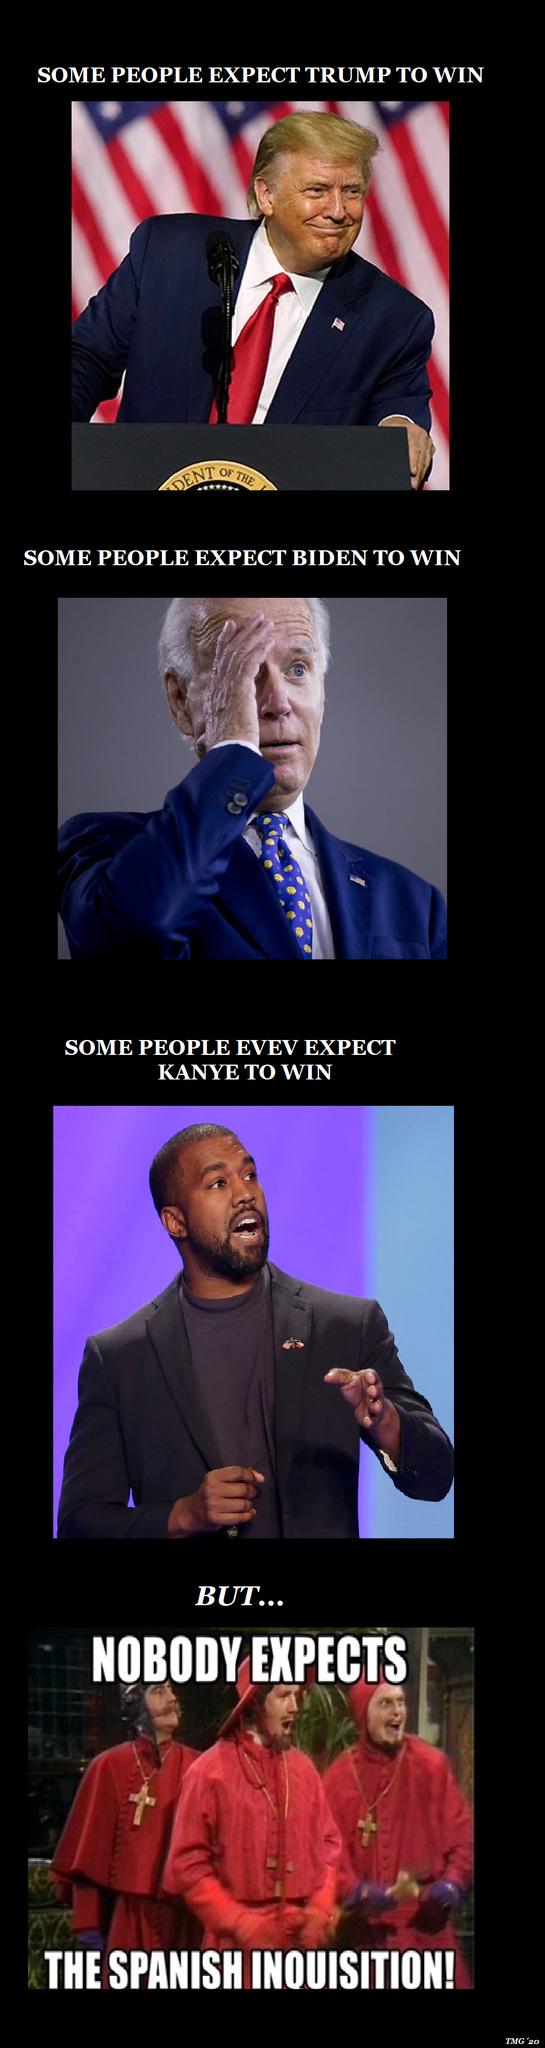 Expectations - meme